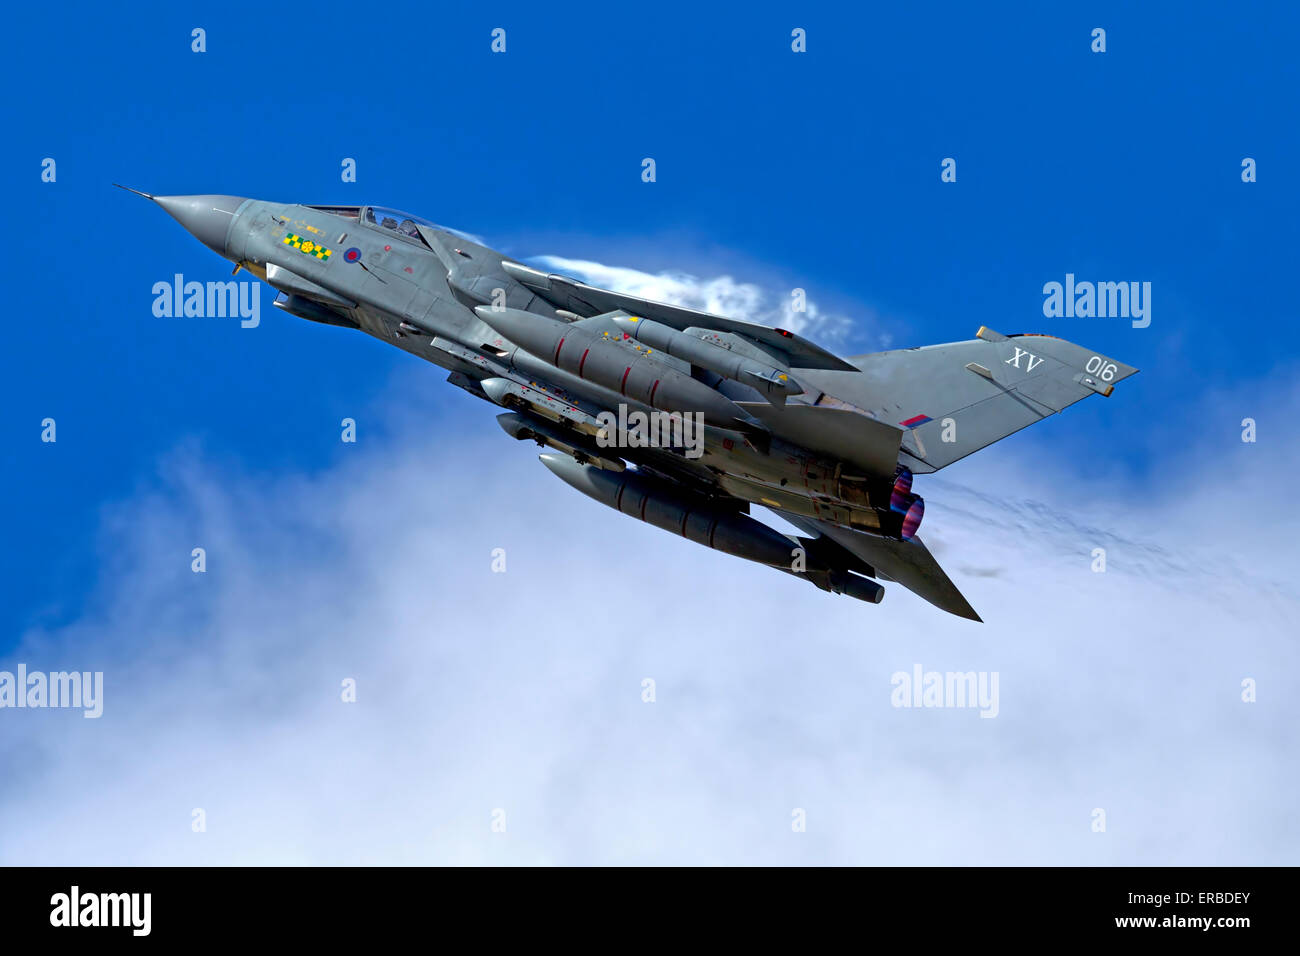 A Royal Air Force Panavia Tornado GR4. - Stock Image